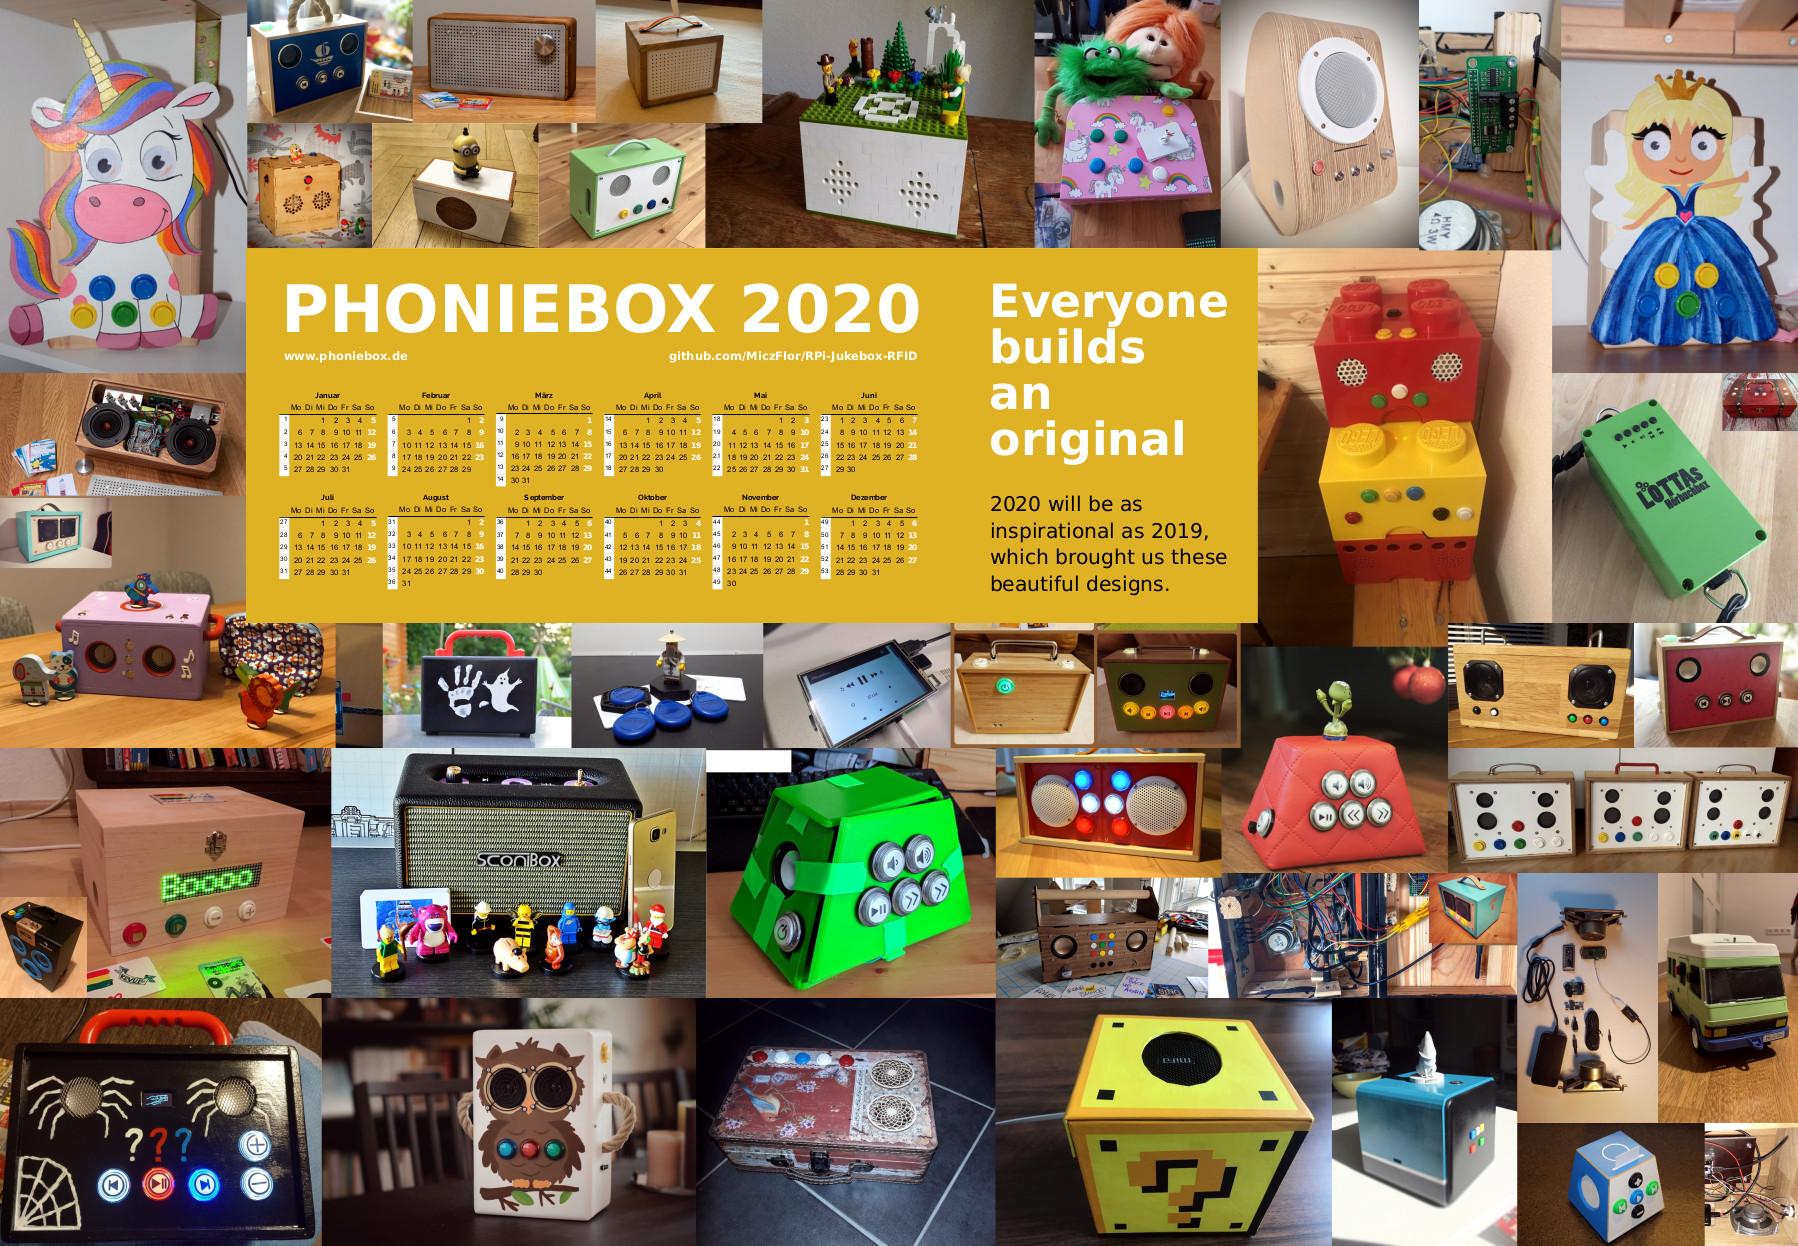 The 2020 Phoniebox Calendar